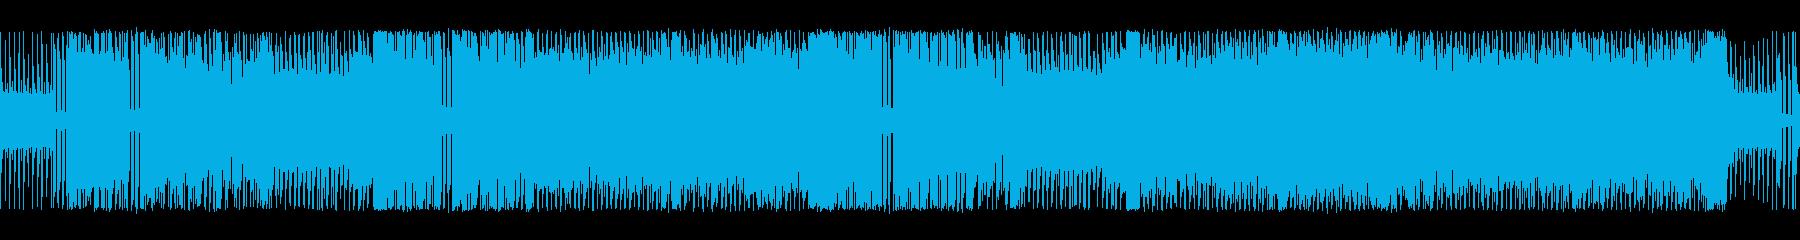 8-Bit_Action Aggressive4の再生済みの波形